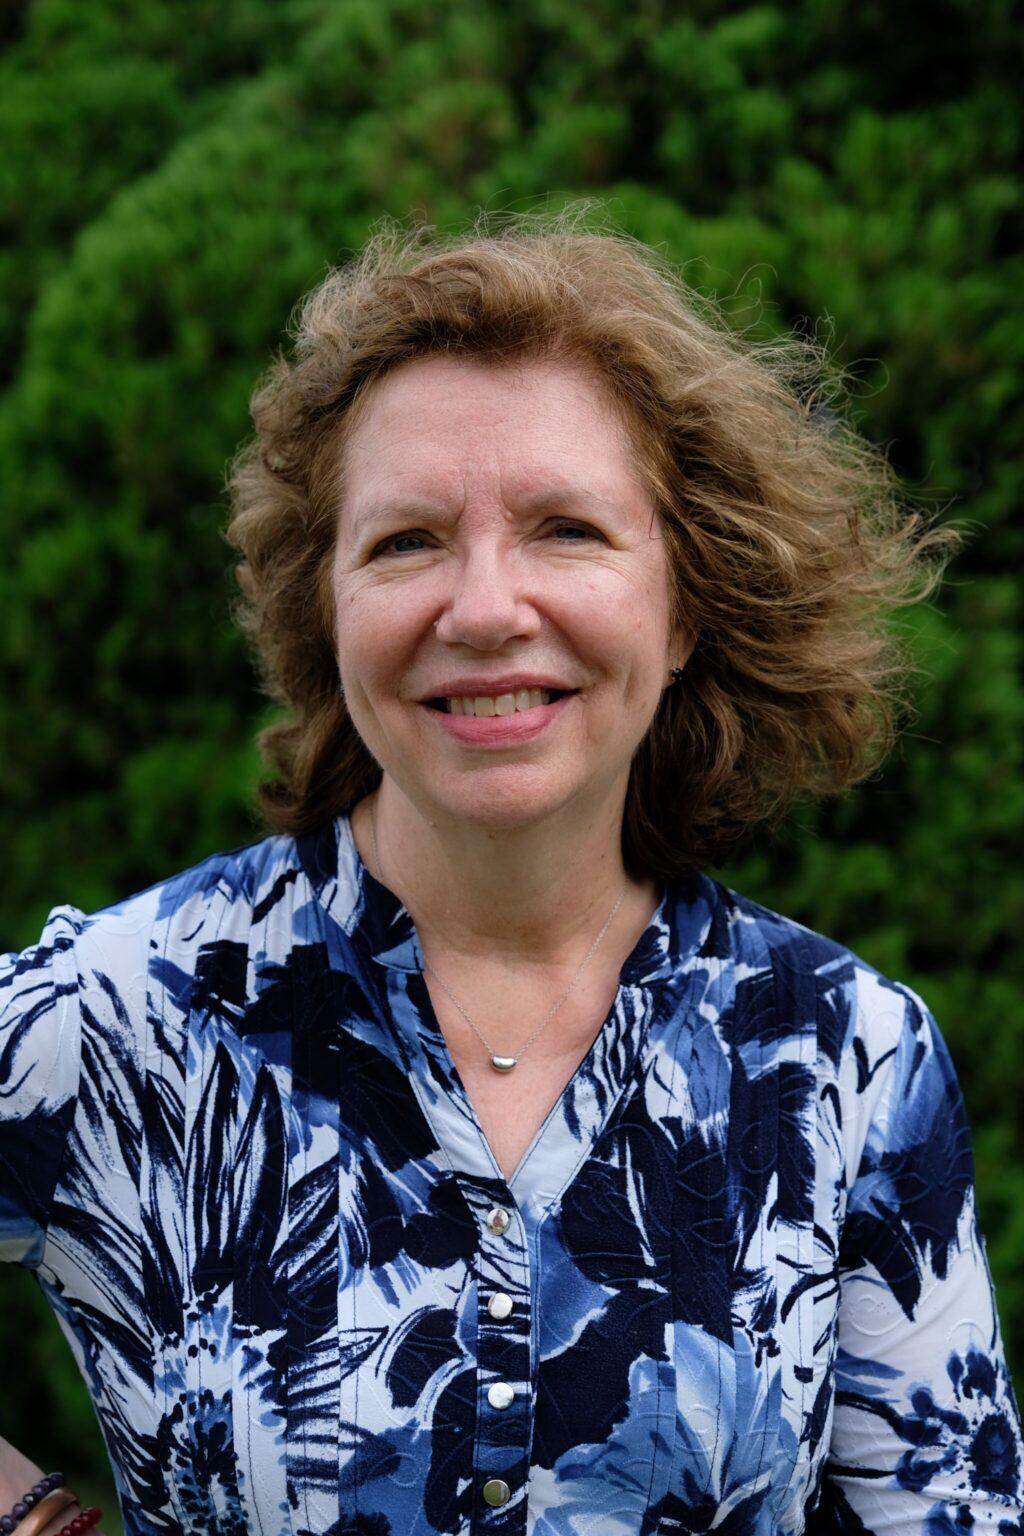 Lynda Sheehan